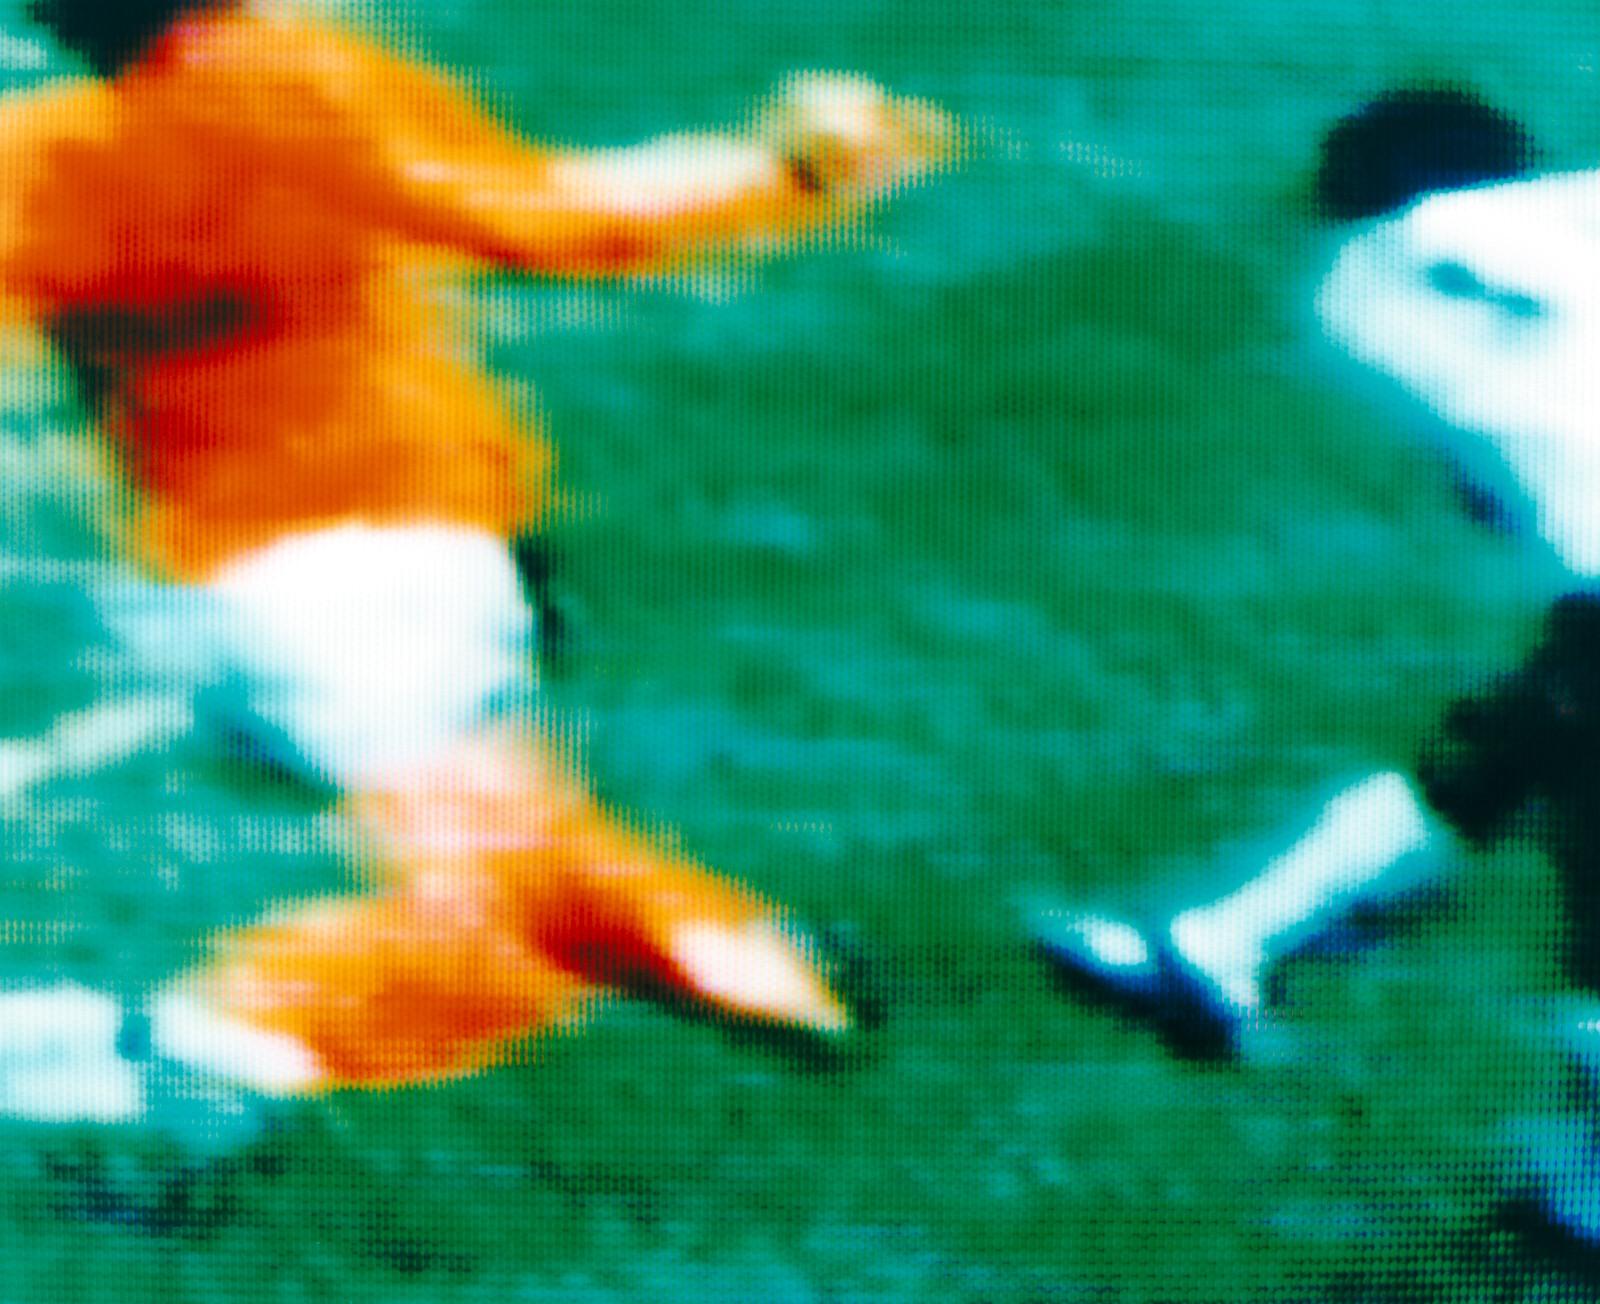 Gerd Muller & Ruud Krol West Germany v Holland 2-1 (Final) 7.07.1974, Olympiastadion, Munich, West Germany - Robert Davies